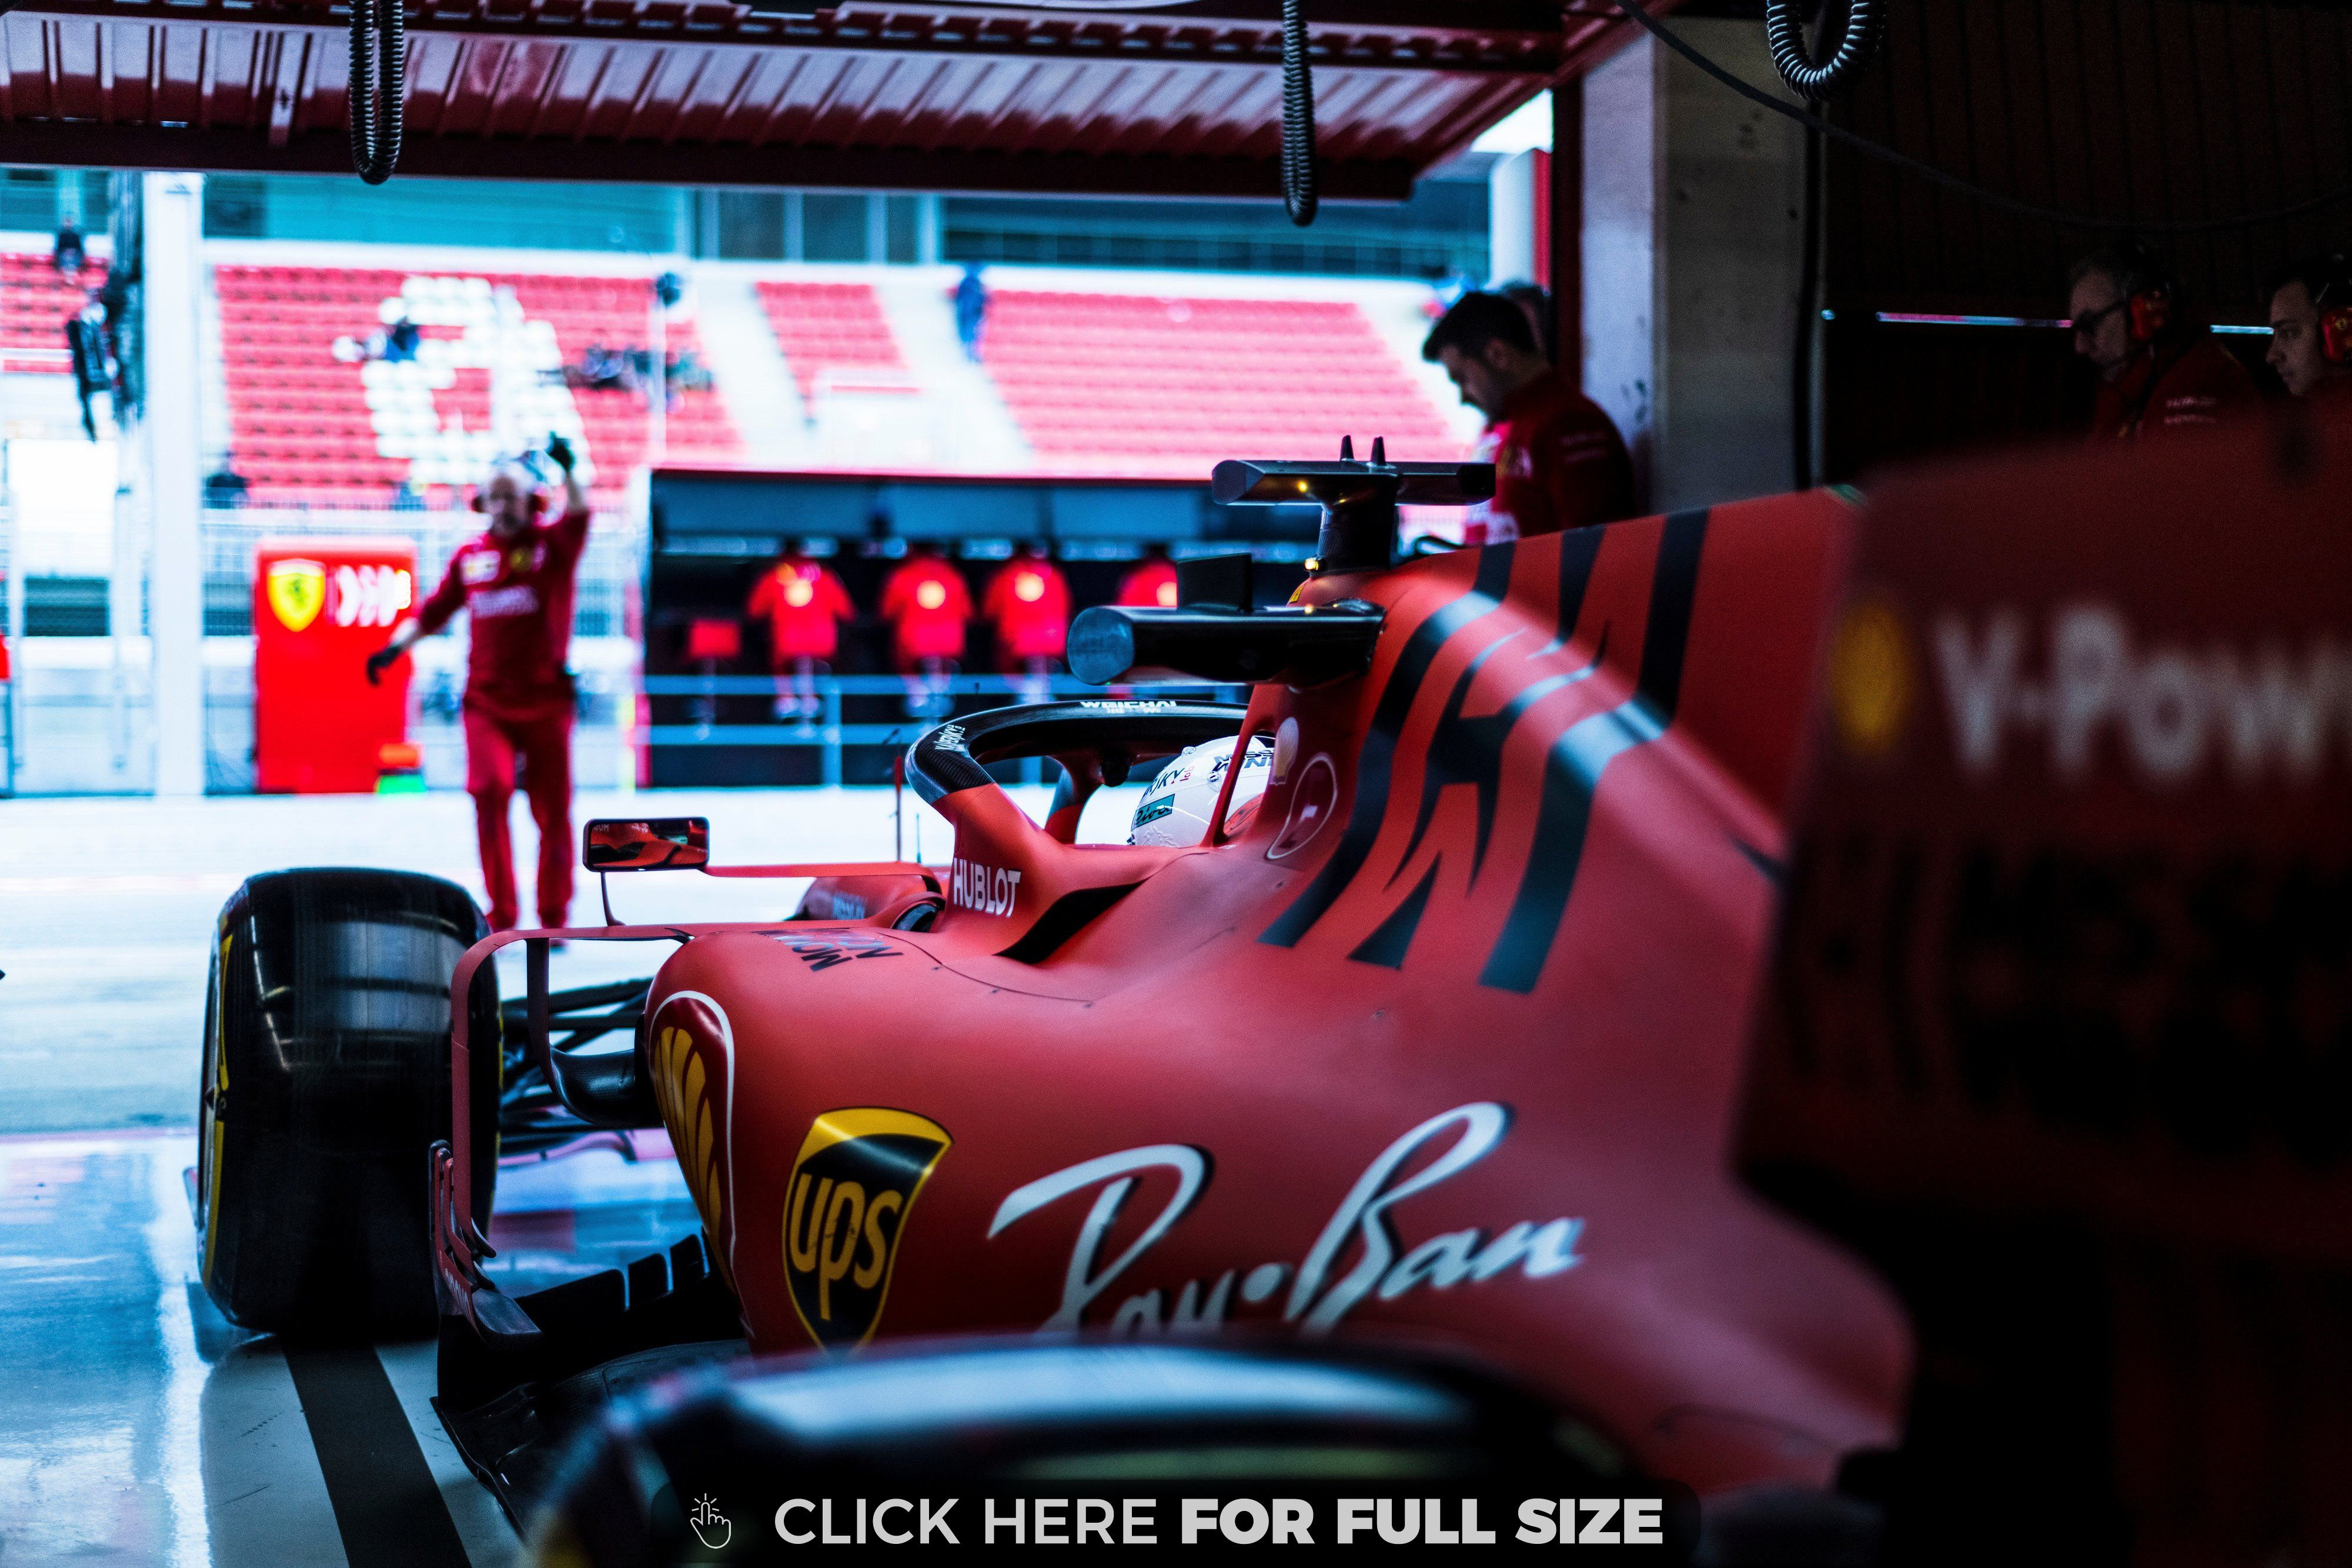 Ferrari Pre Season 4k Wallpaper In 2020 Formula 1 Ferrari Sports Wallpapers